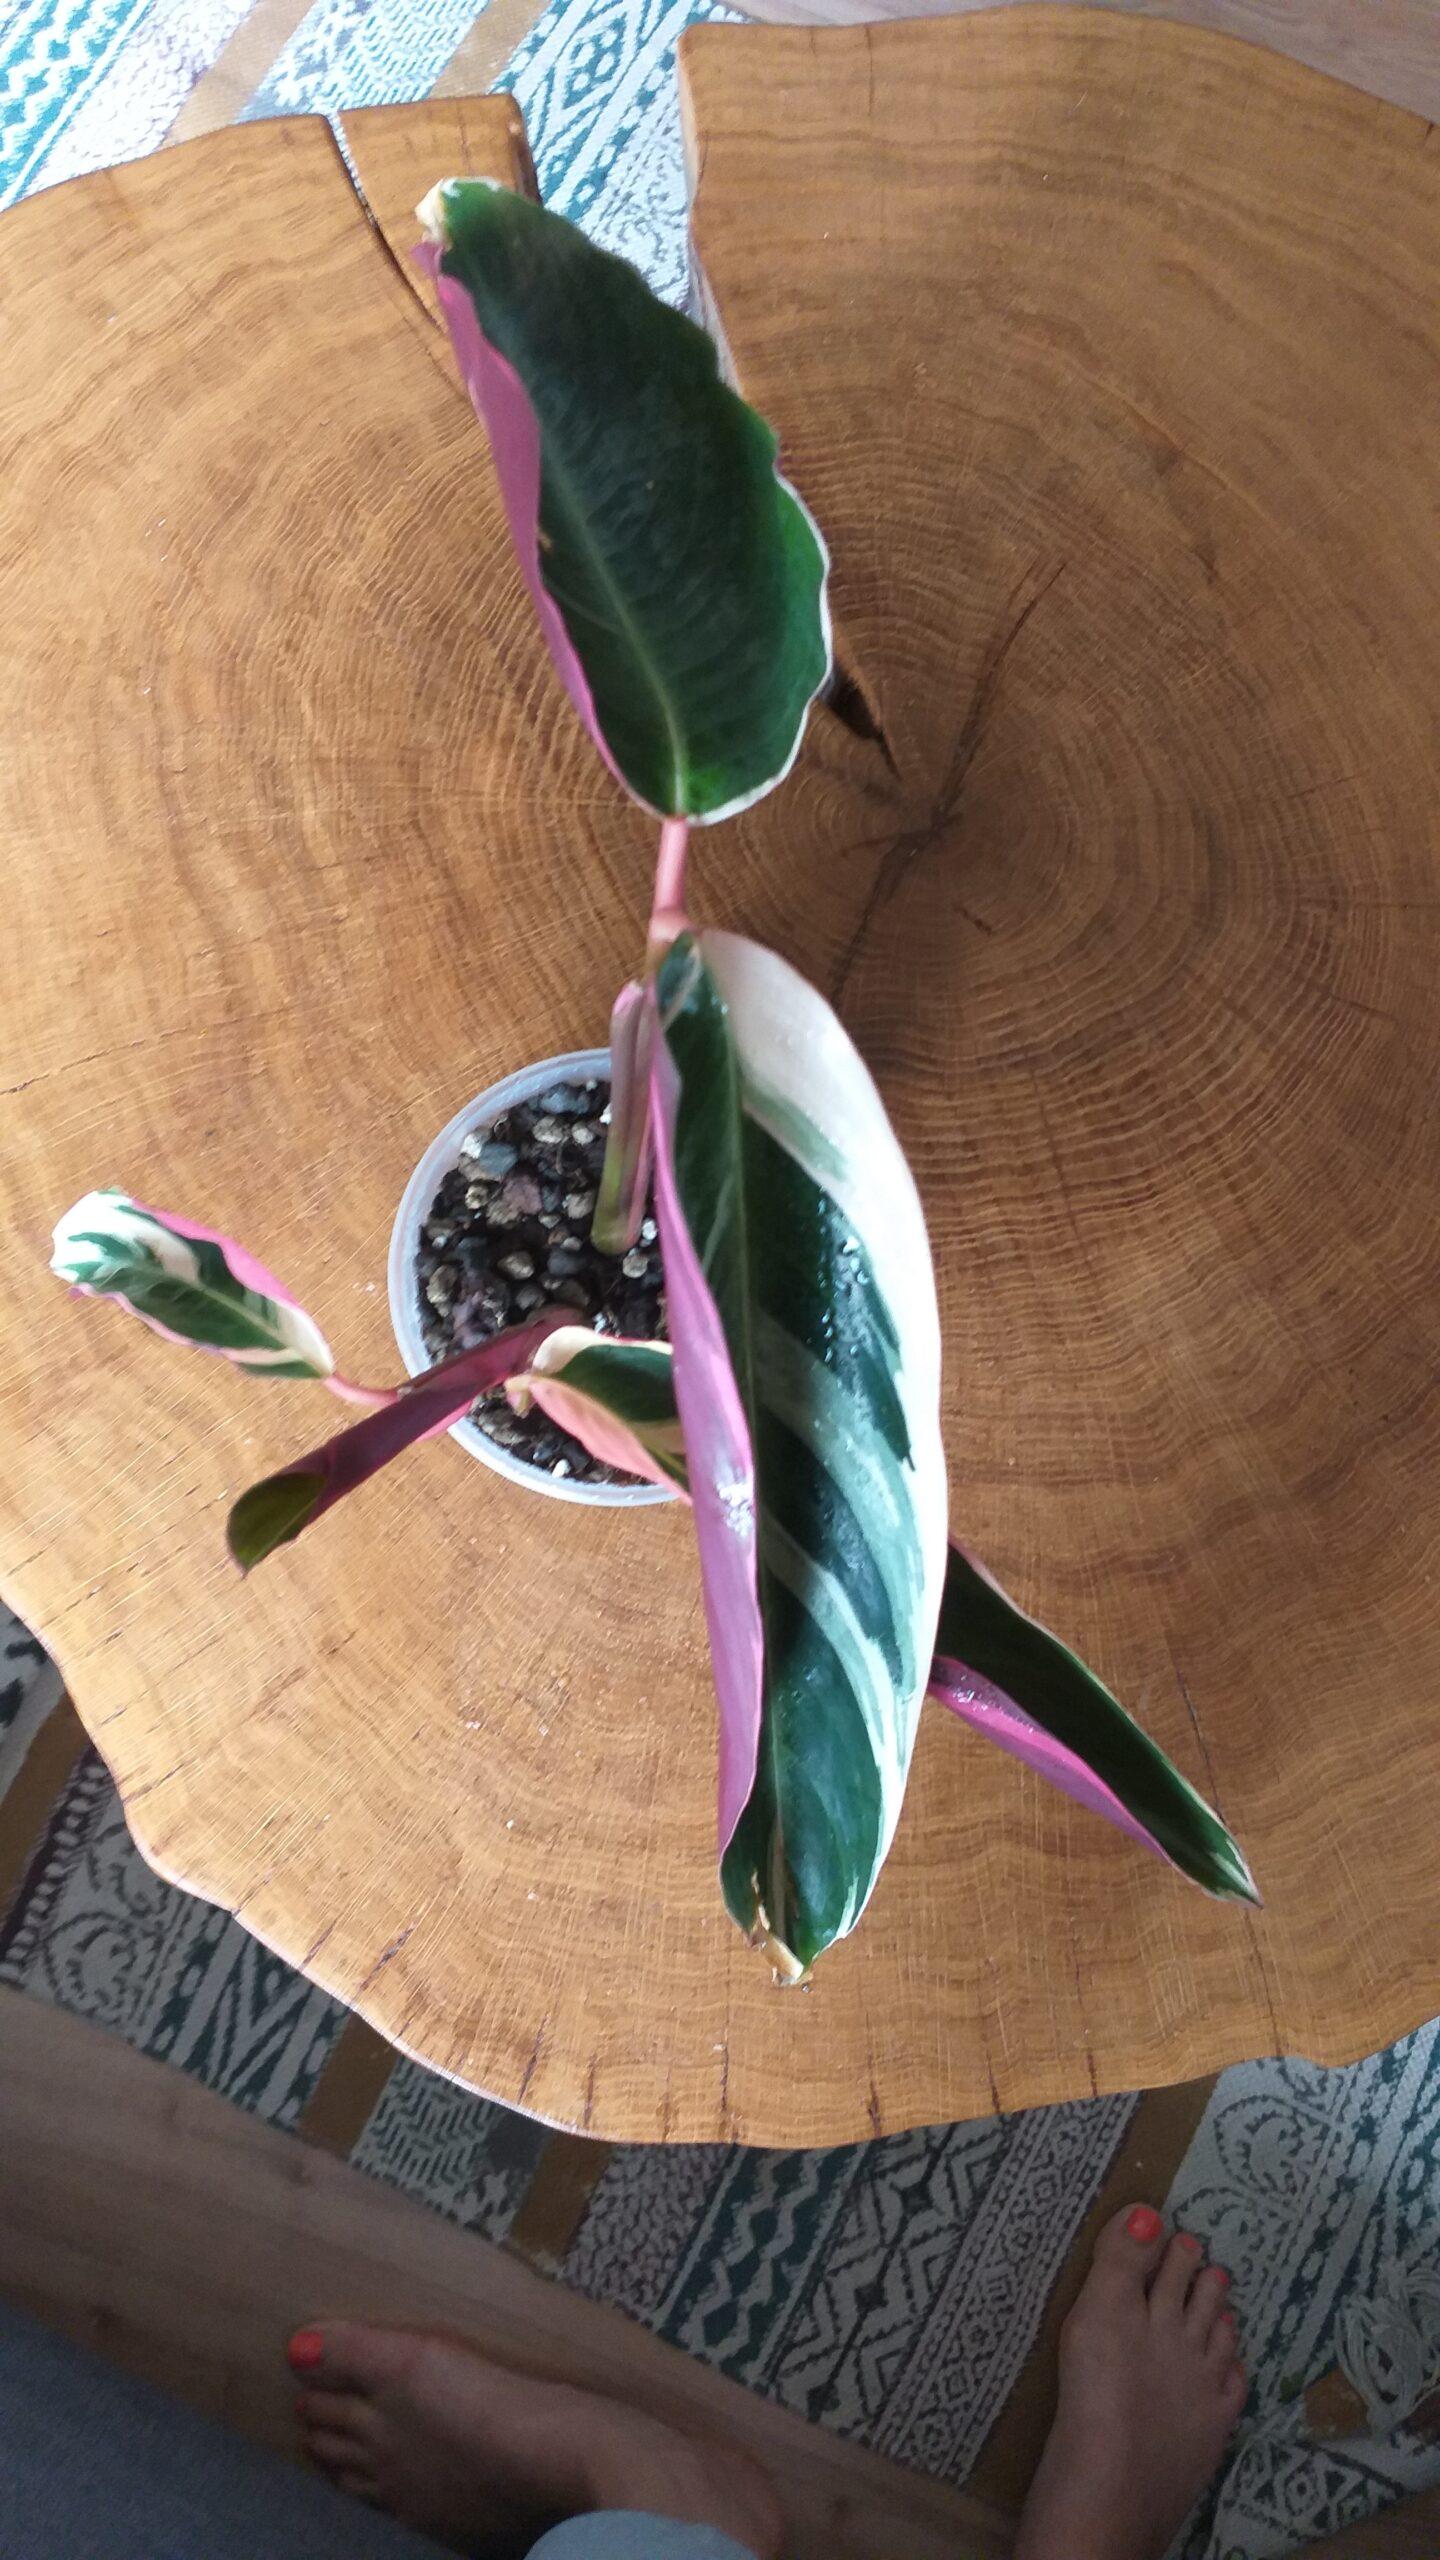 Calathea Tricolour Jungpflanze- kräftig durchwurzelt